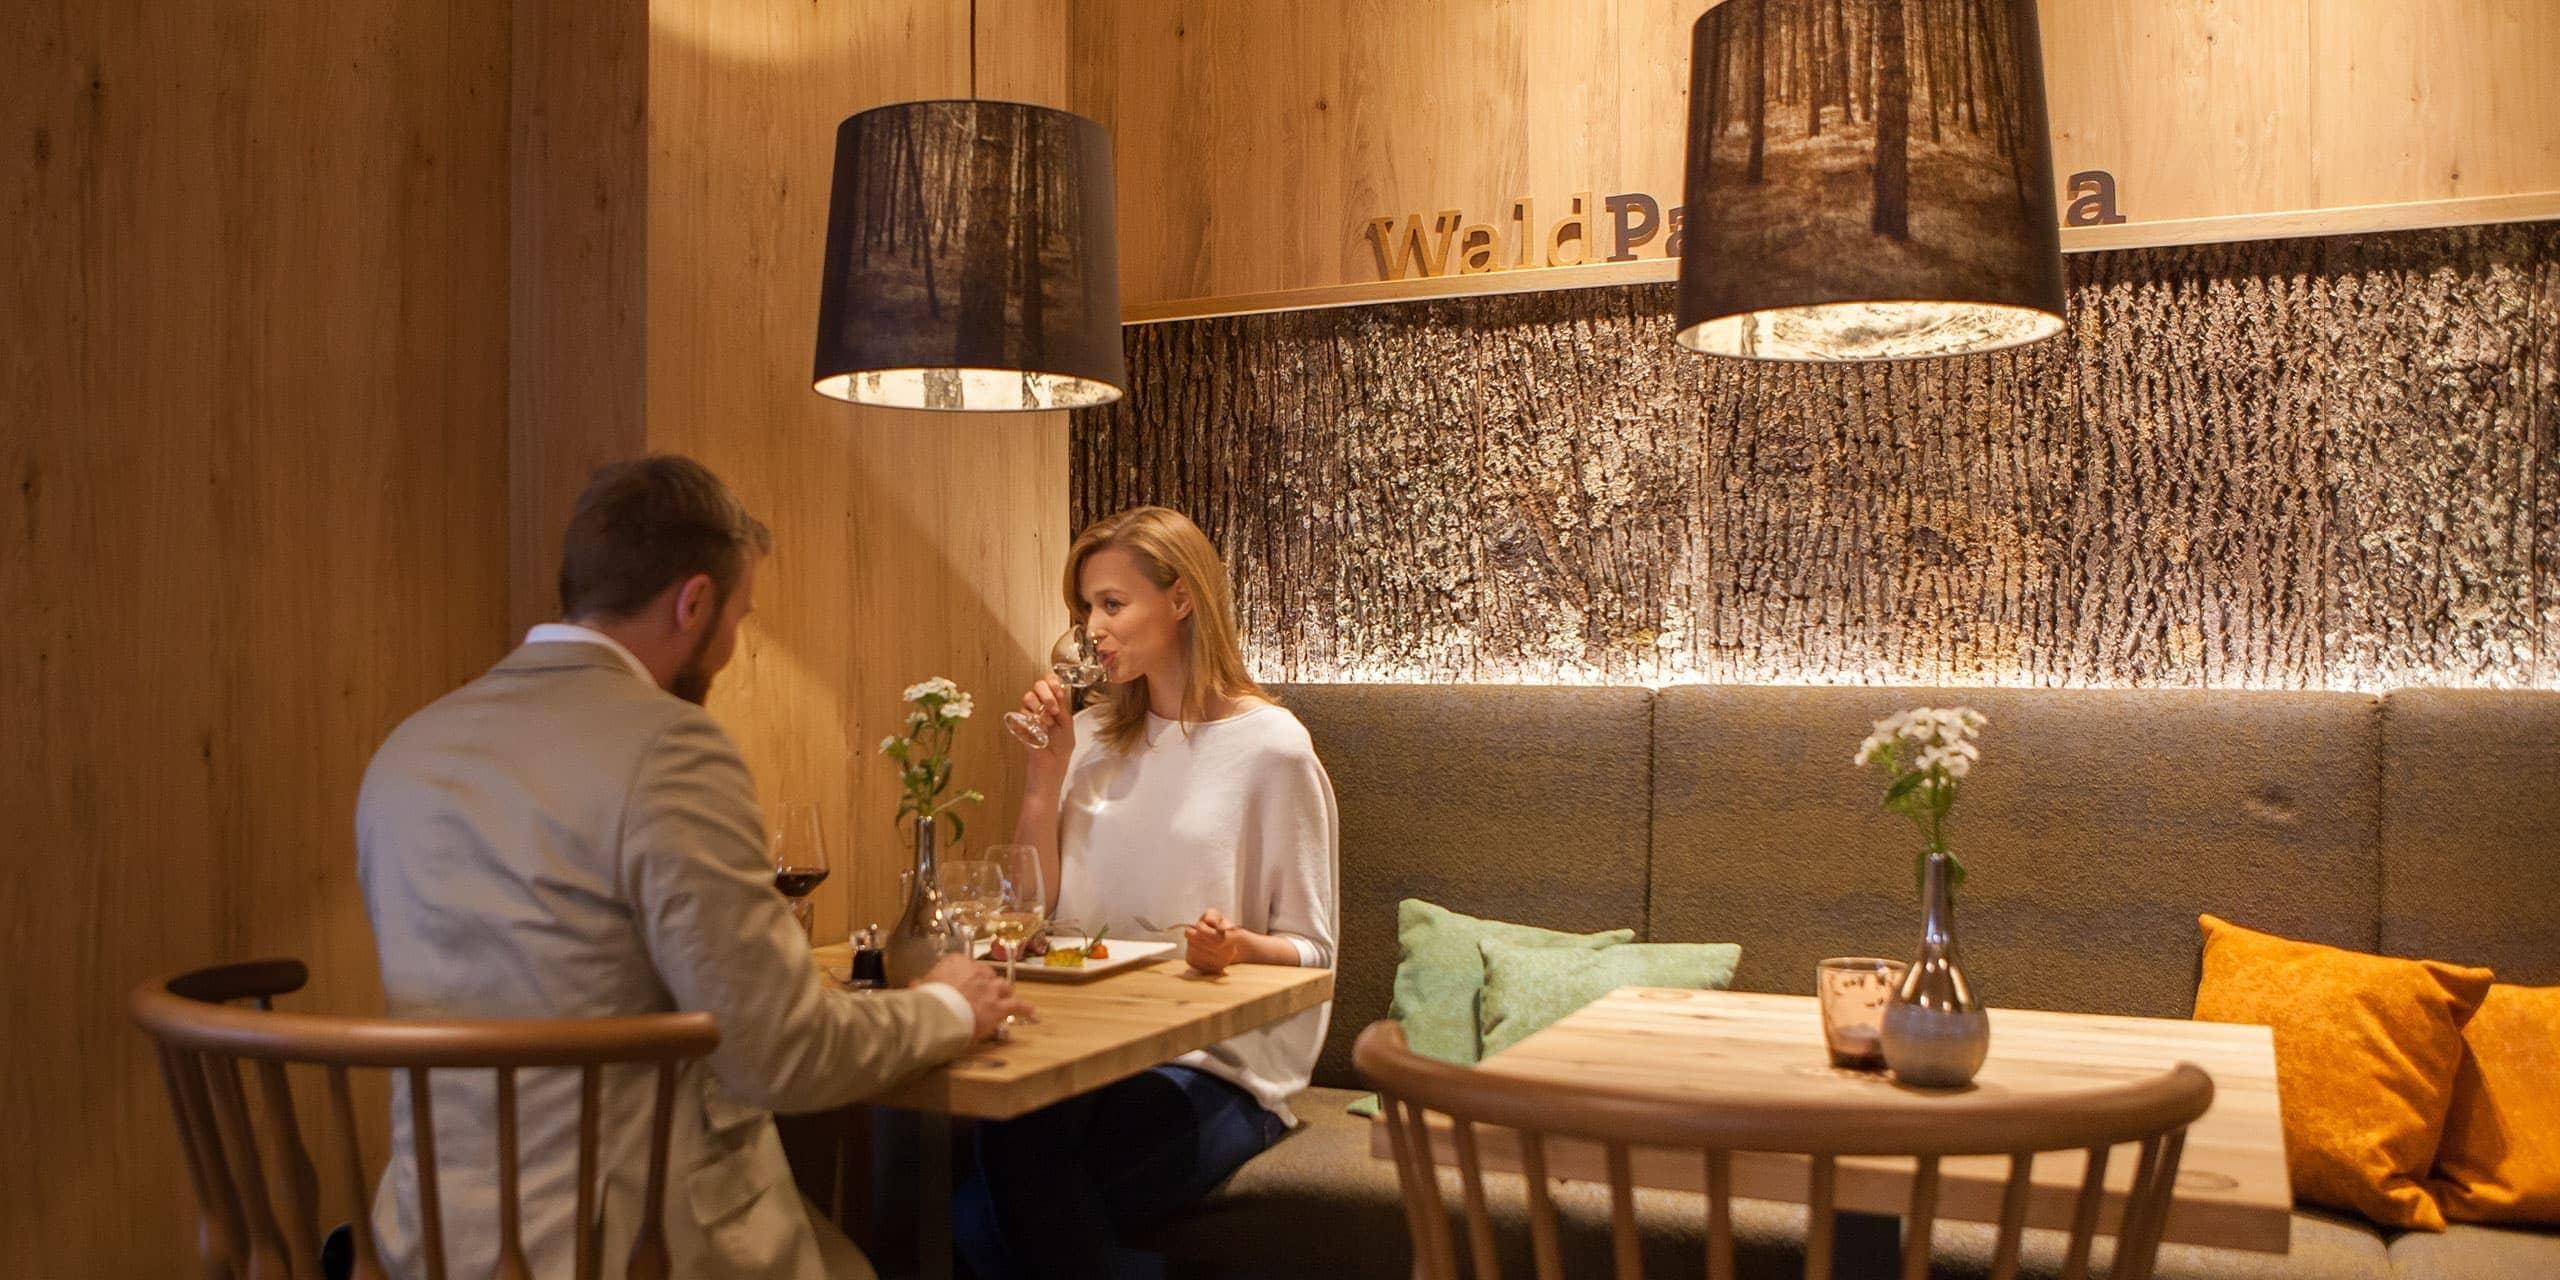 Wald Panorama Restaurant